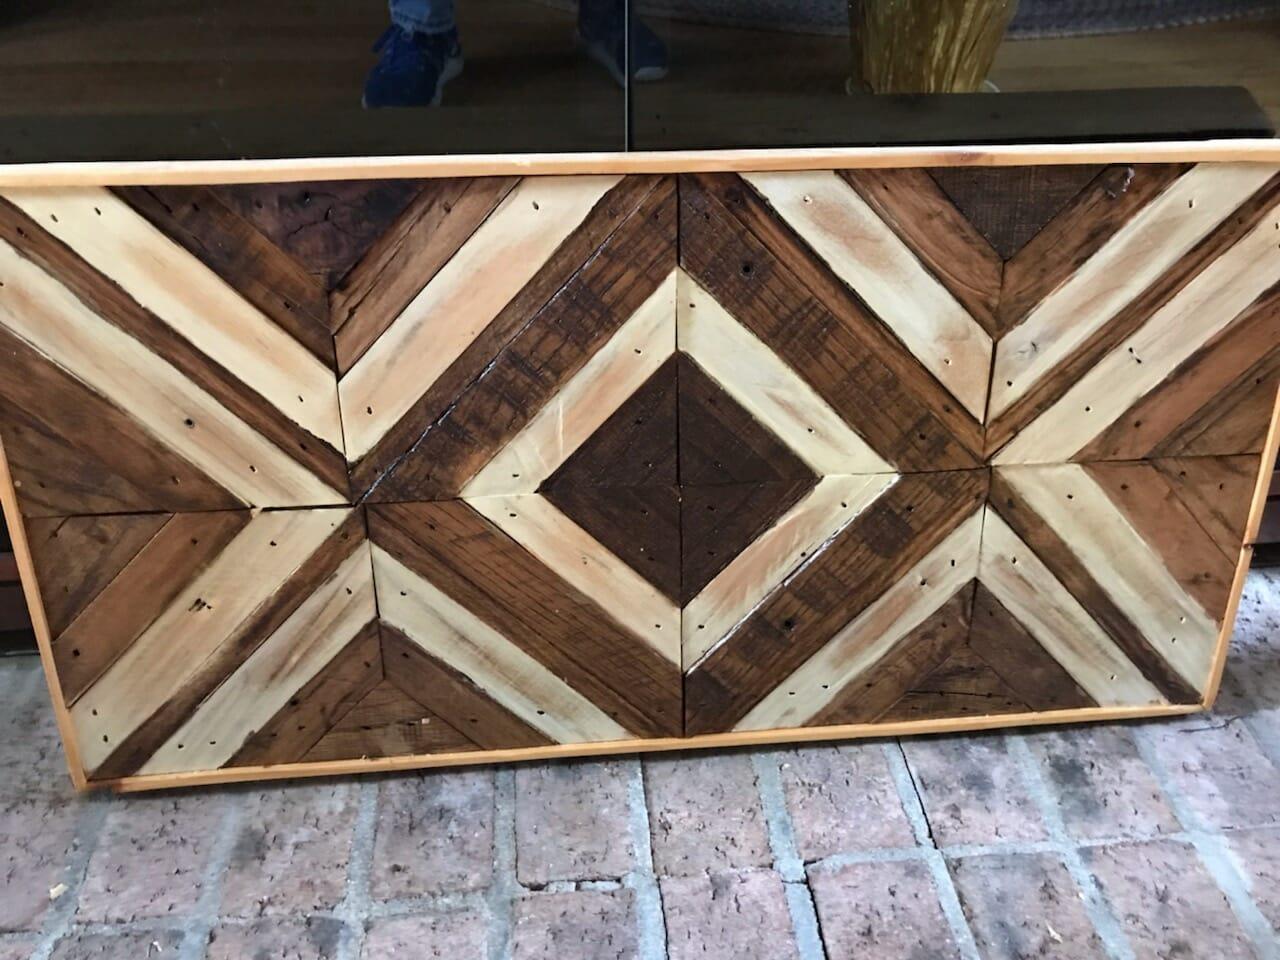 https://supermomhacks.com/ stuff-i-love/the-benefits-of-solid-wood-furniture/